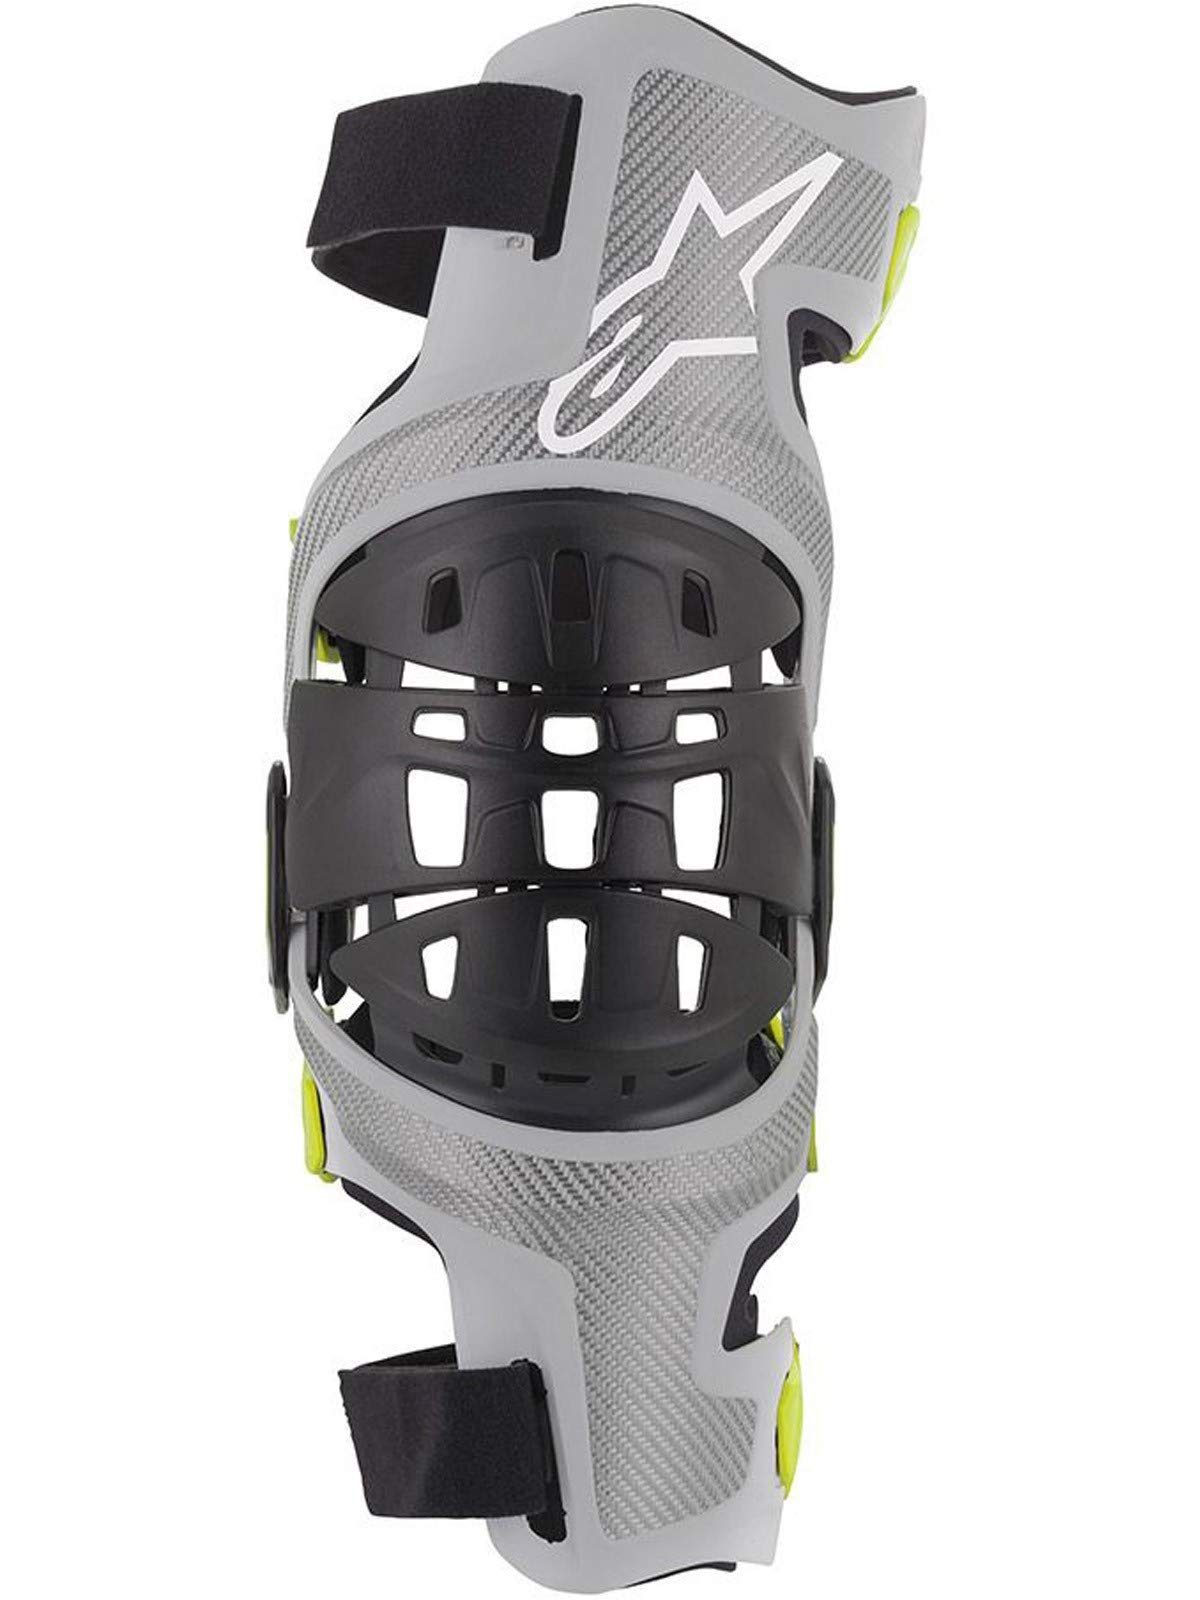 Bionic-7 Off-Road Motocross Knee Brace Set (Medium, Silver Yellow Fluo) by Alpinestars (Image #3)